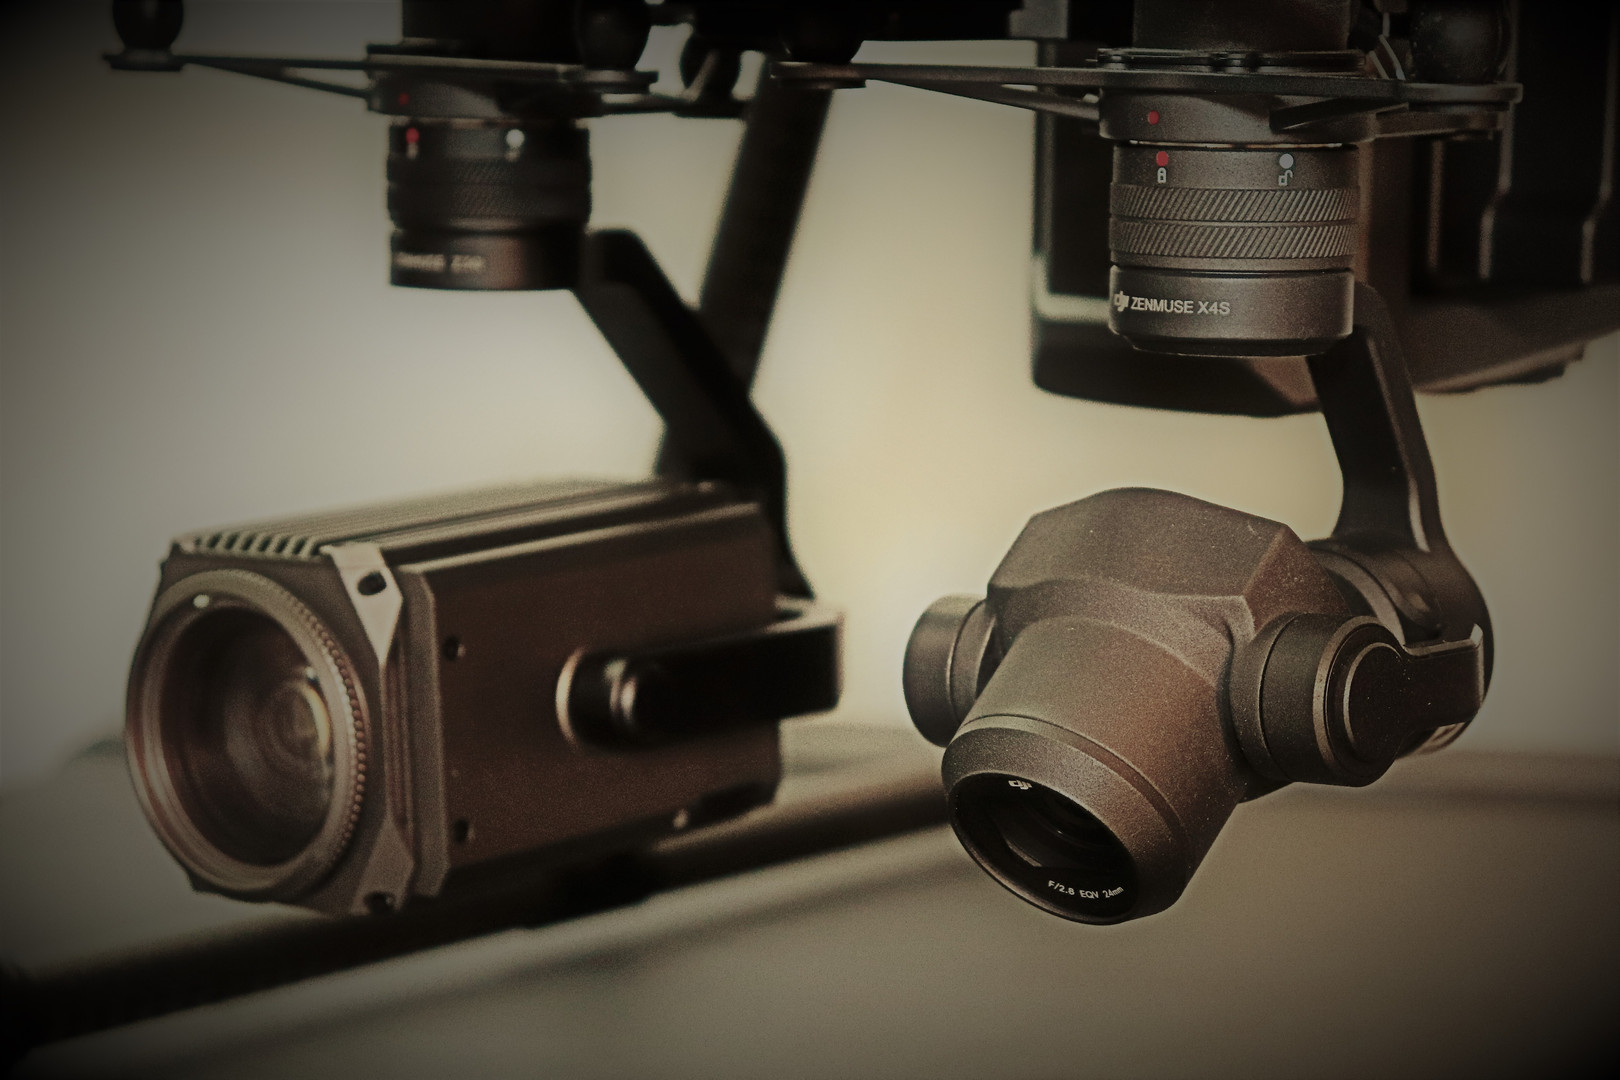 AEKO Camera zenmuse